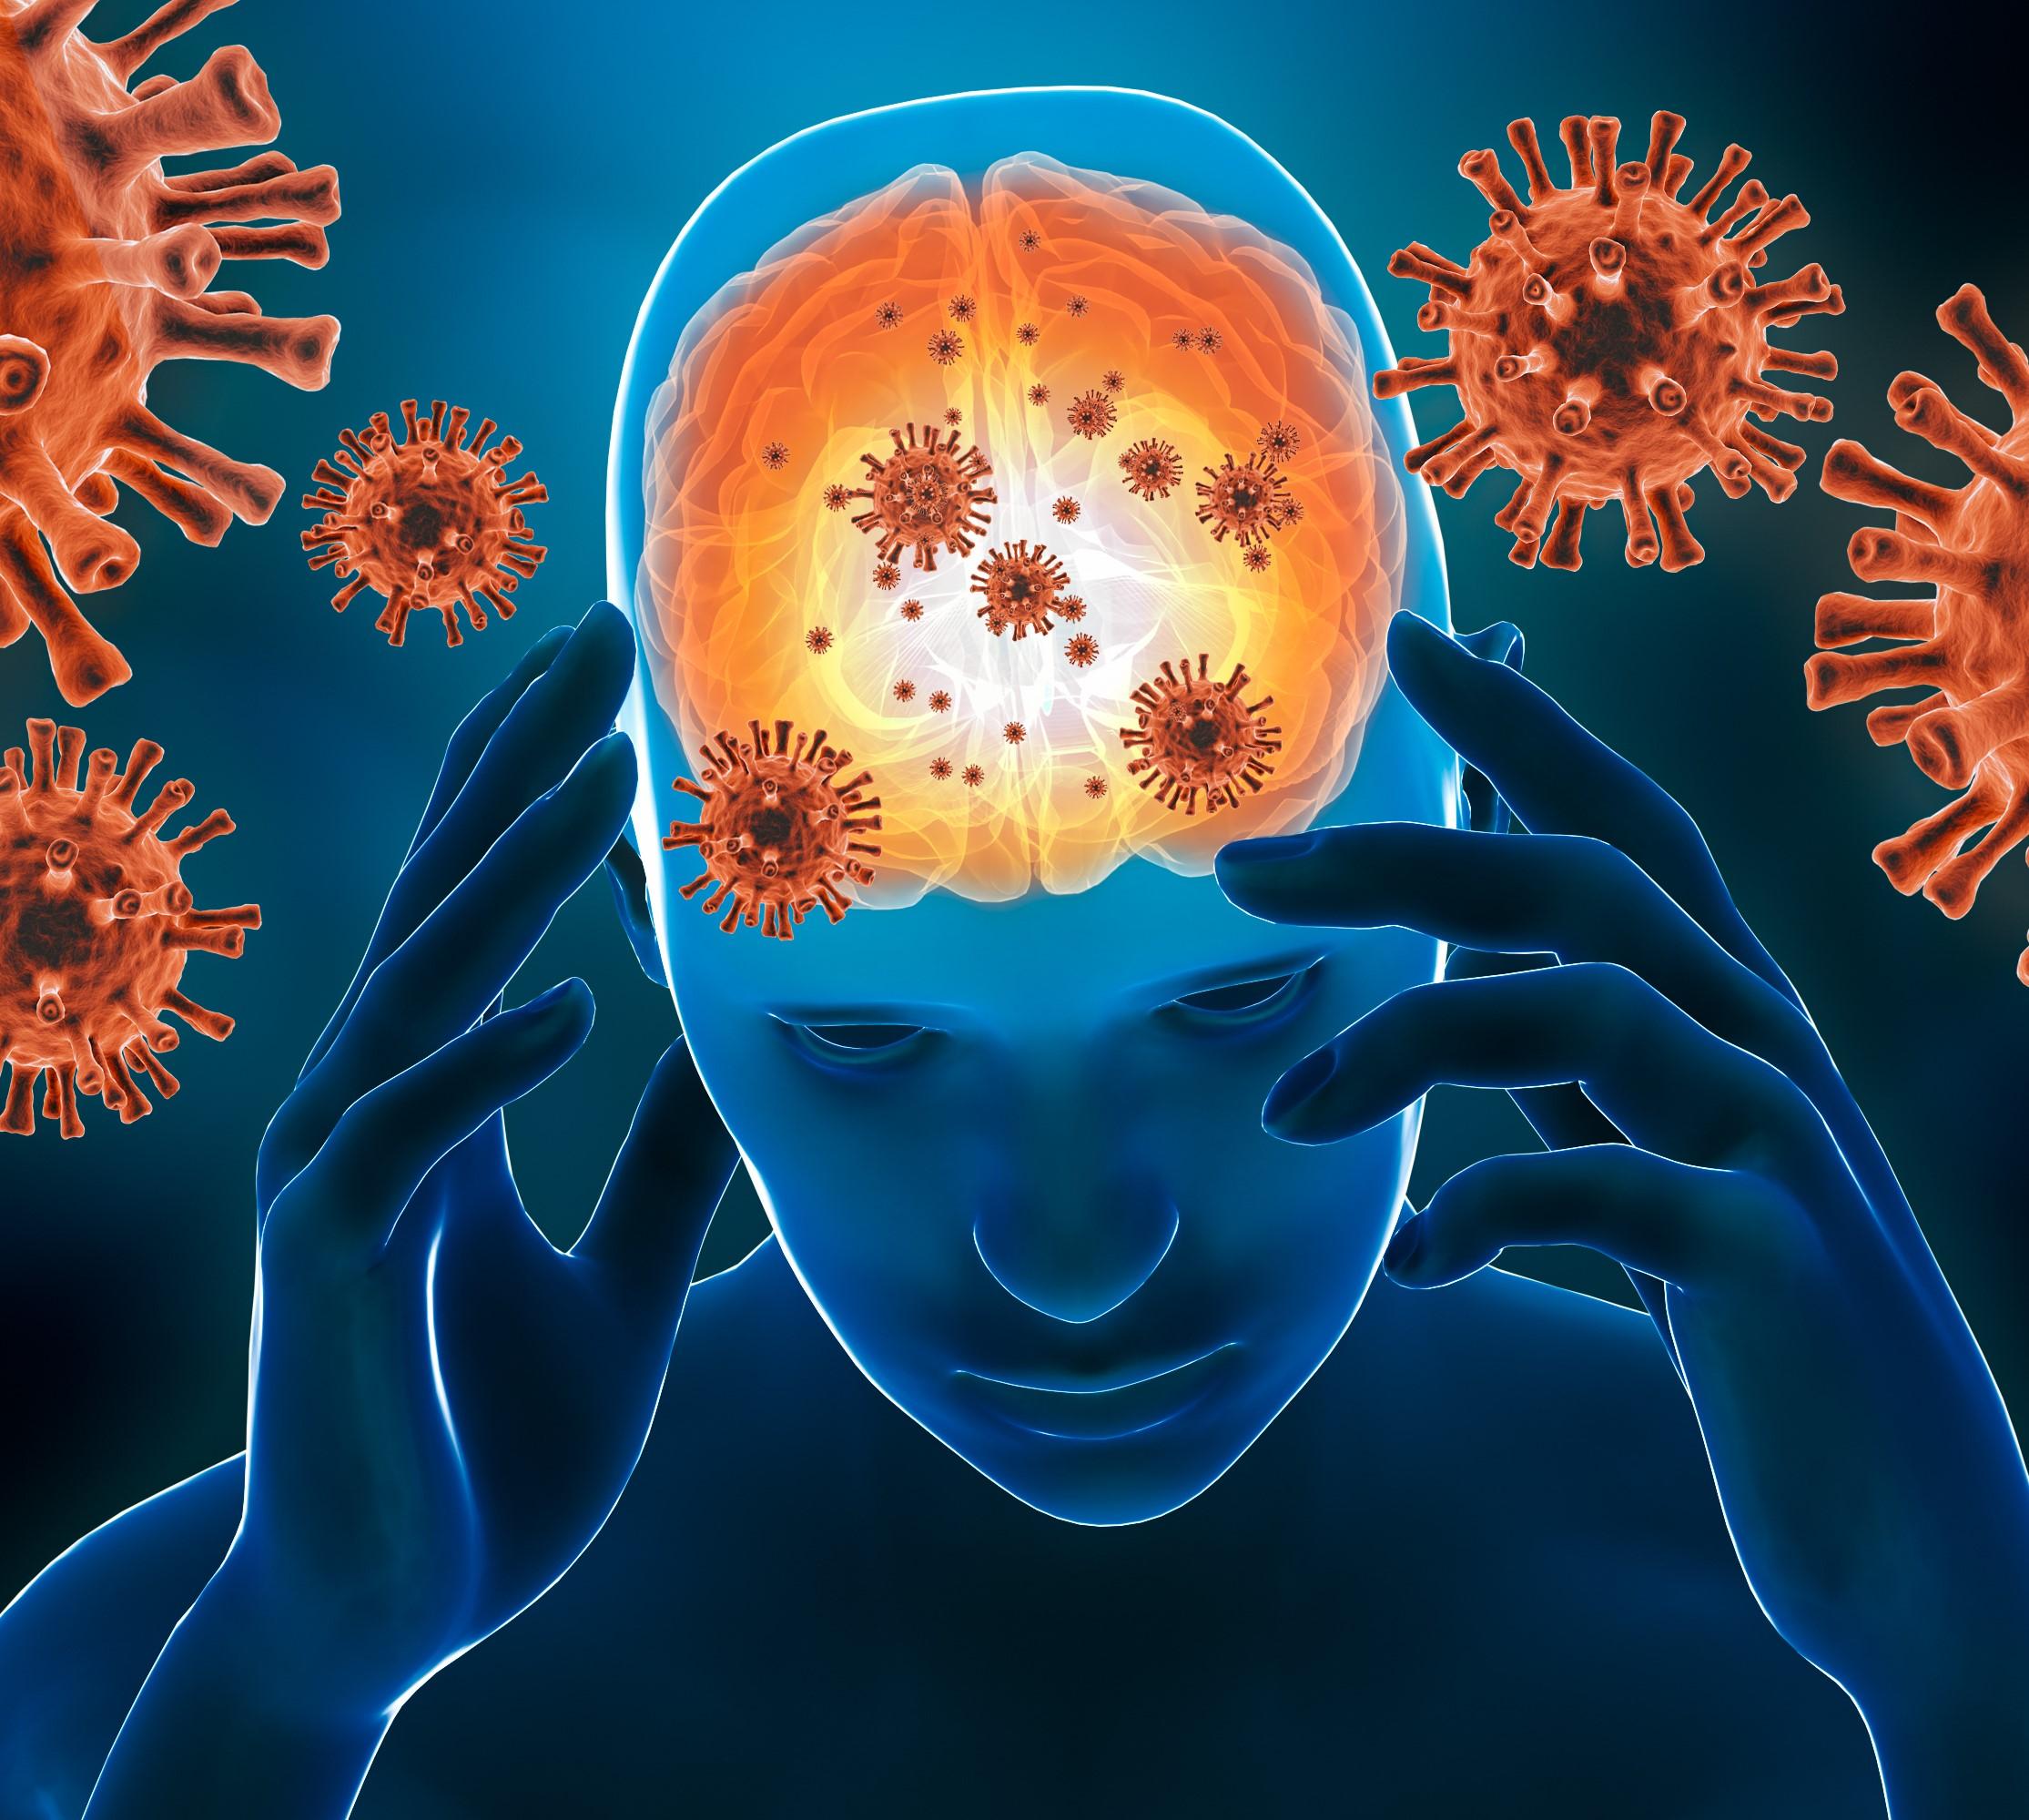 Meningite atuando no cérebro humano